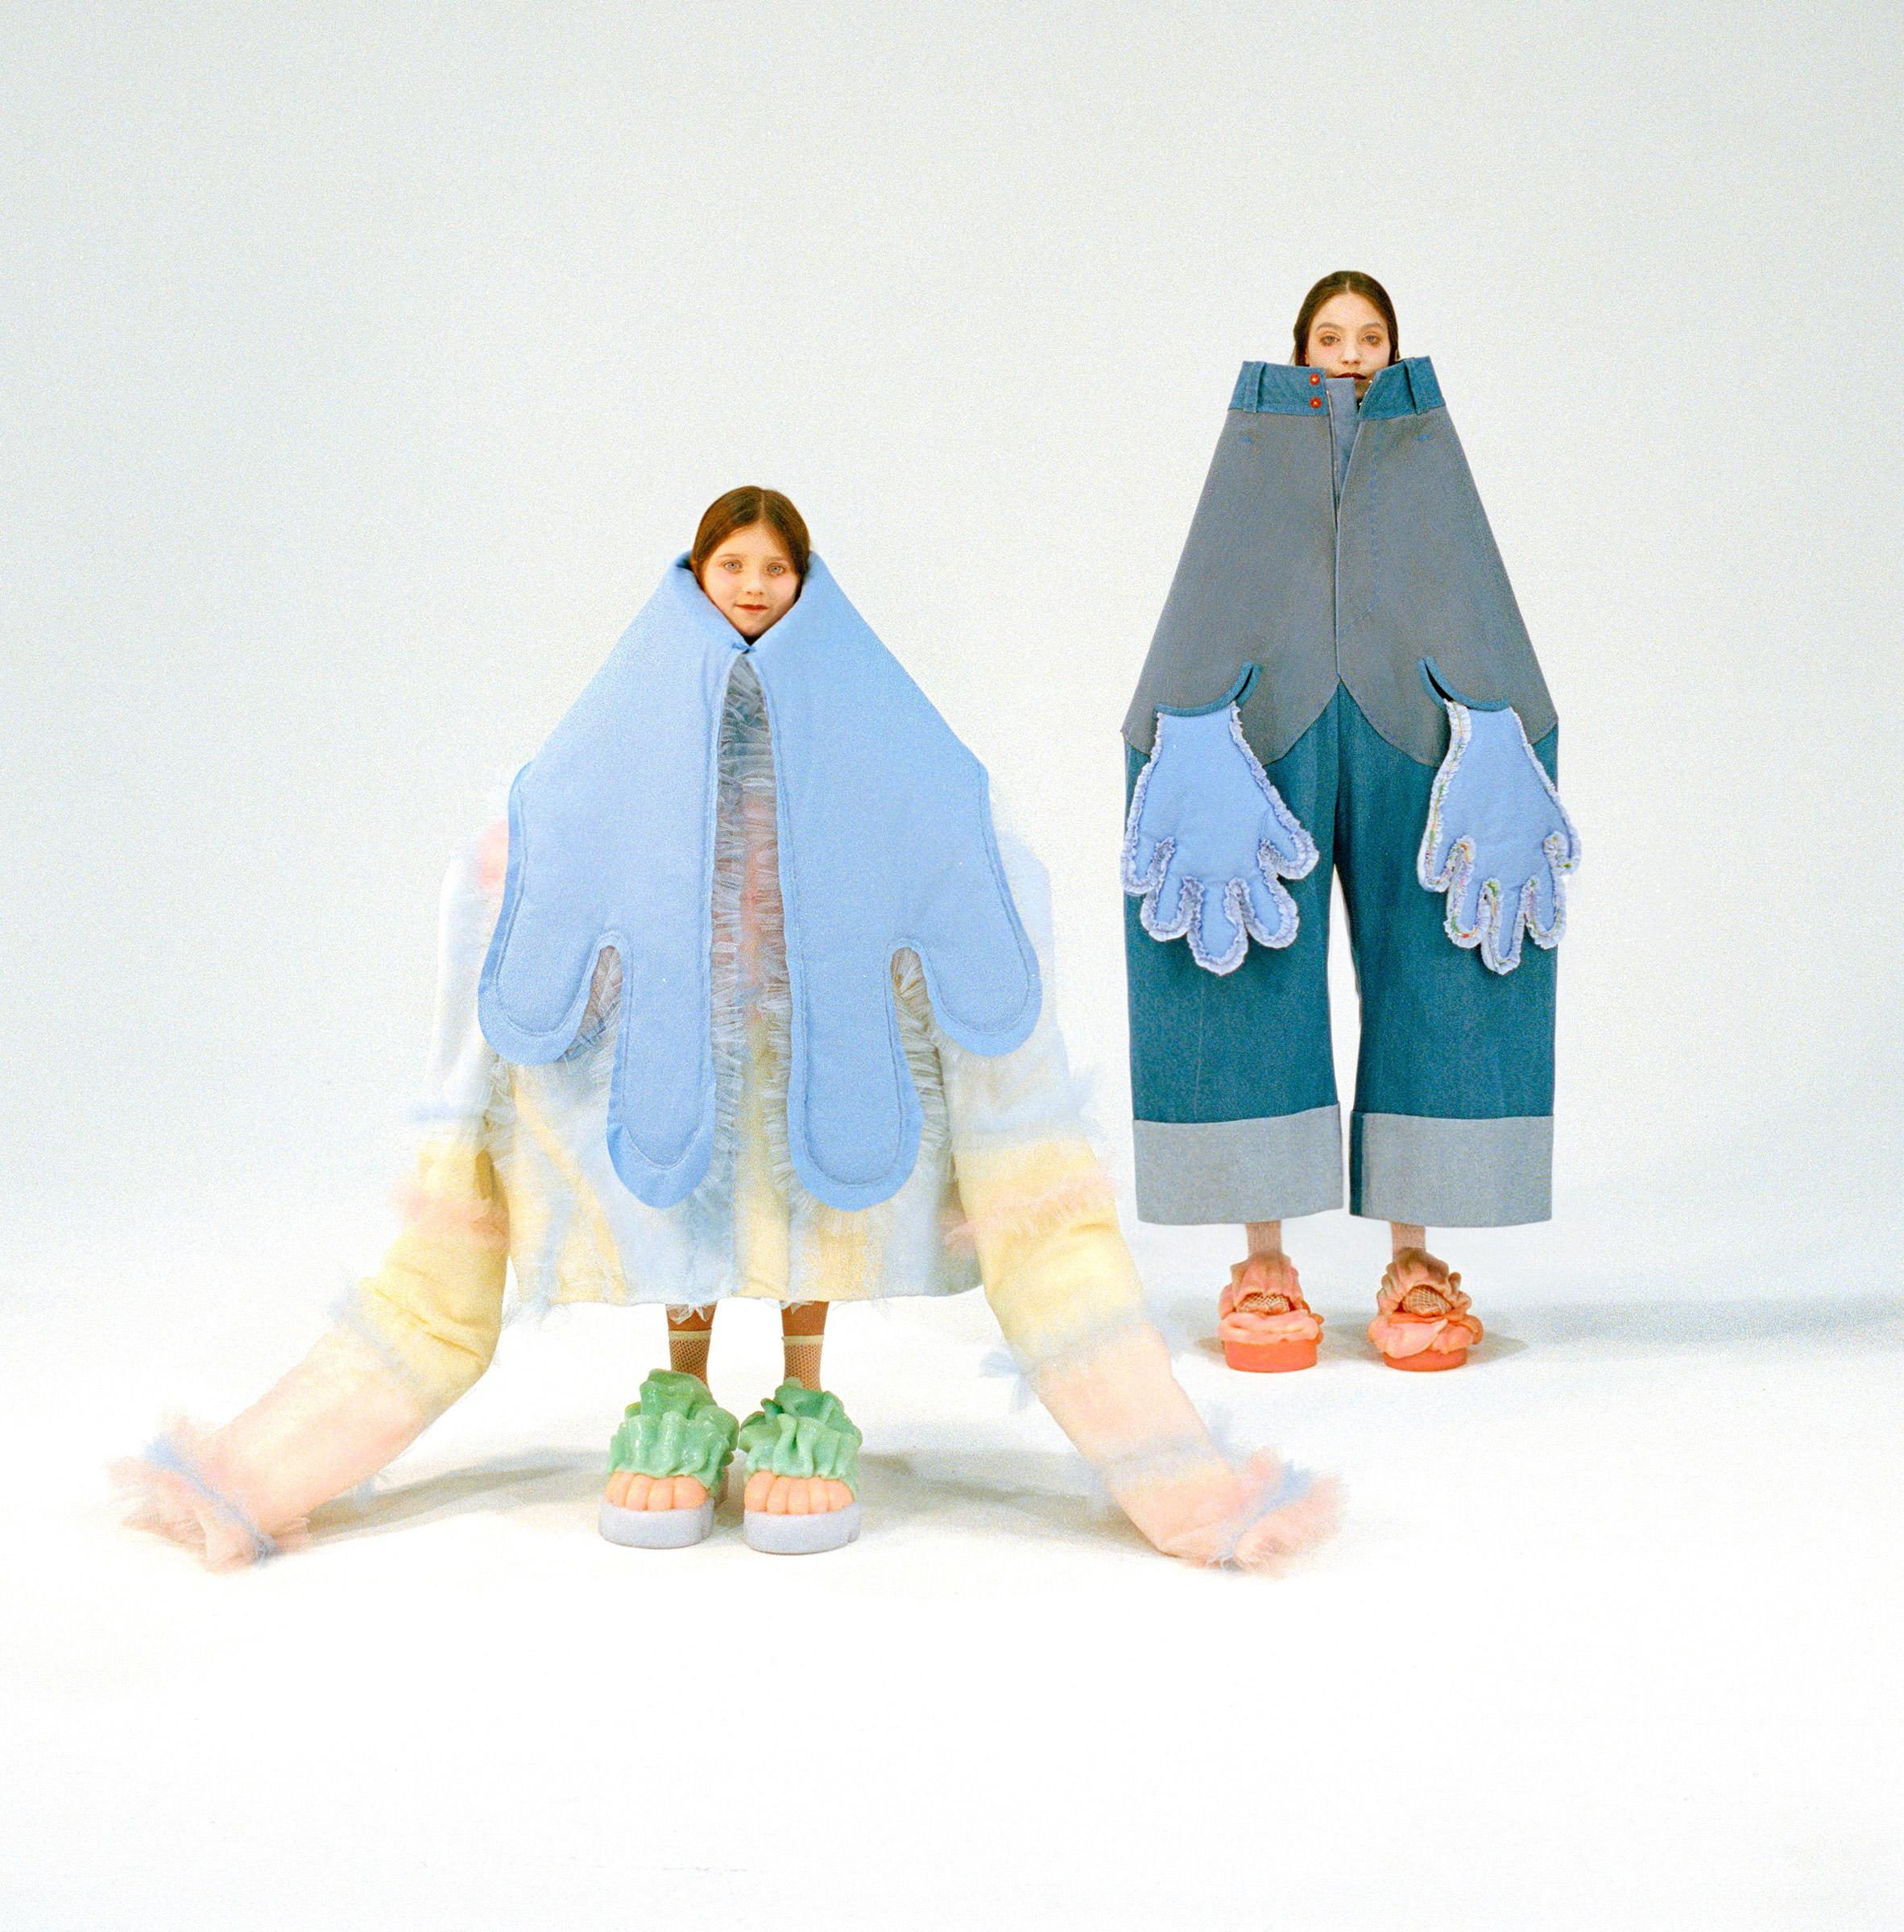 Beate Karlsson's fashion designs feature oversized versions of singular garments